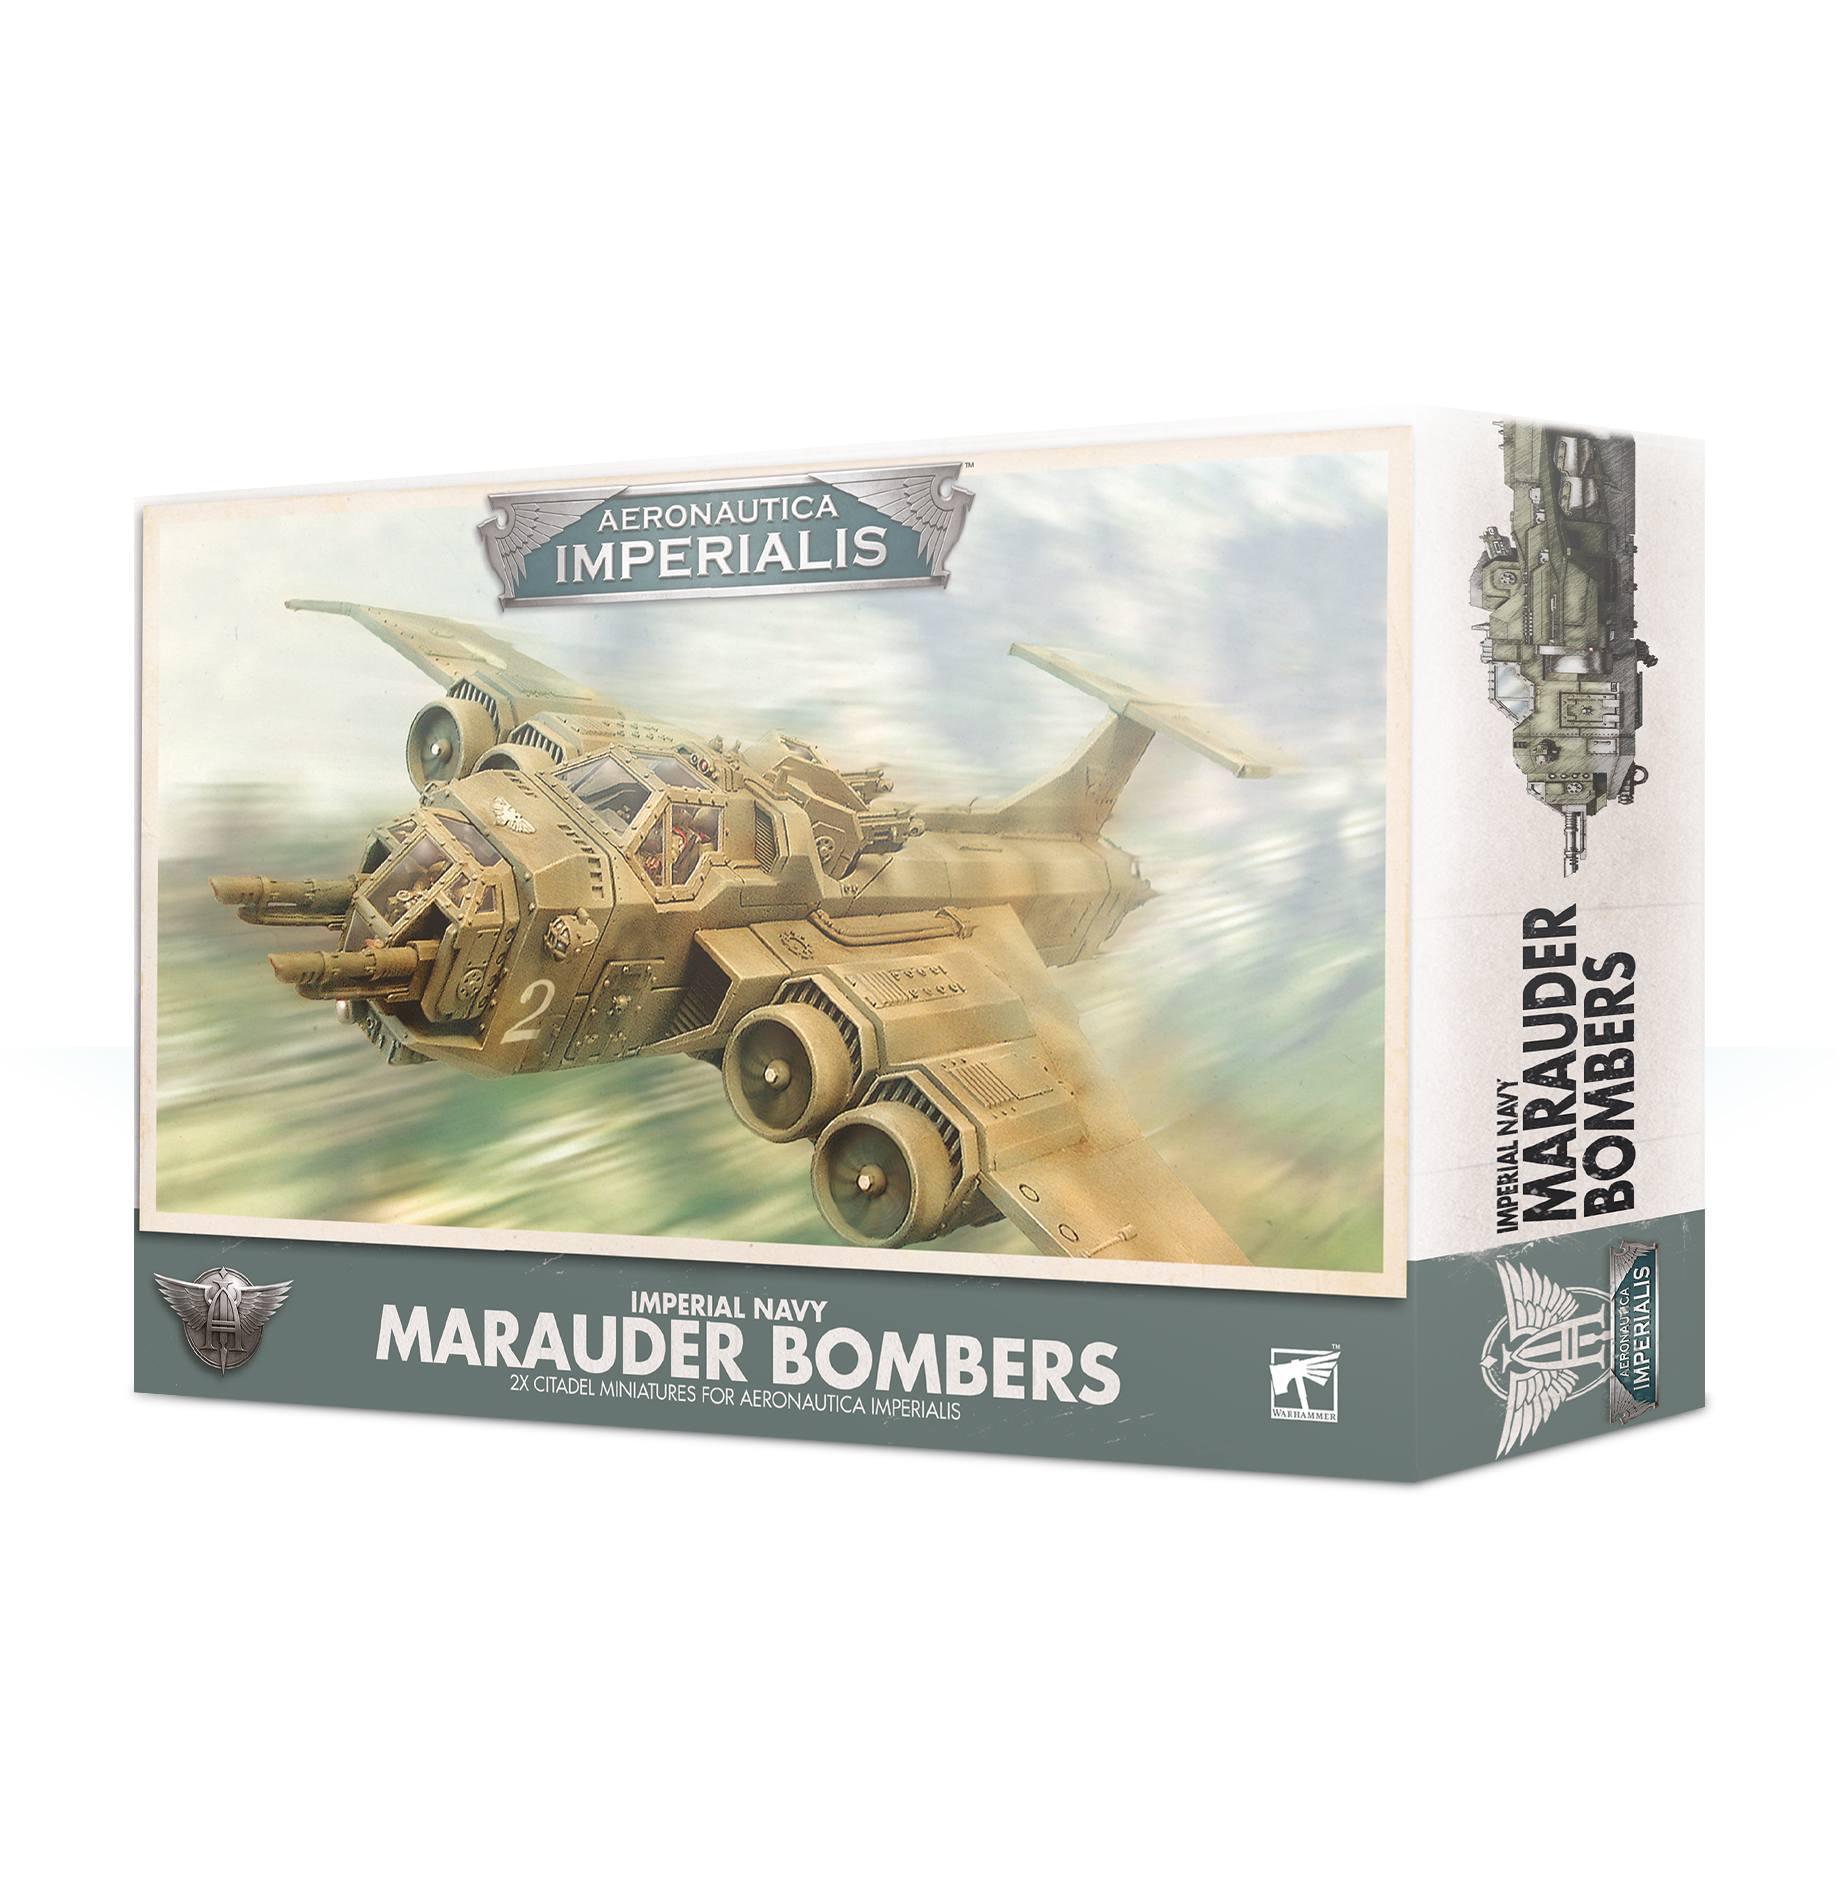 Marauder Bombers, Imperial Navy, Aeronautica Imperialis